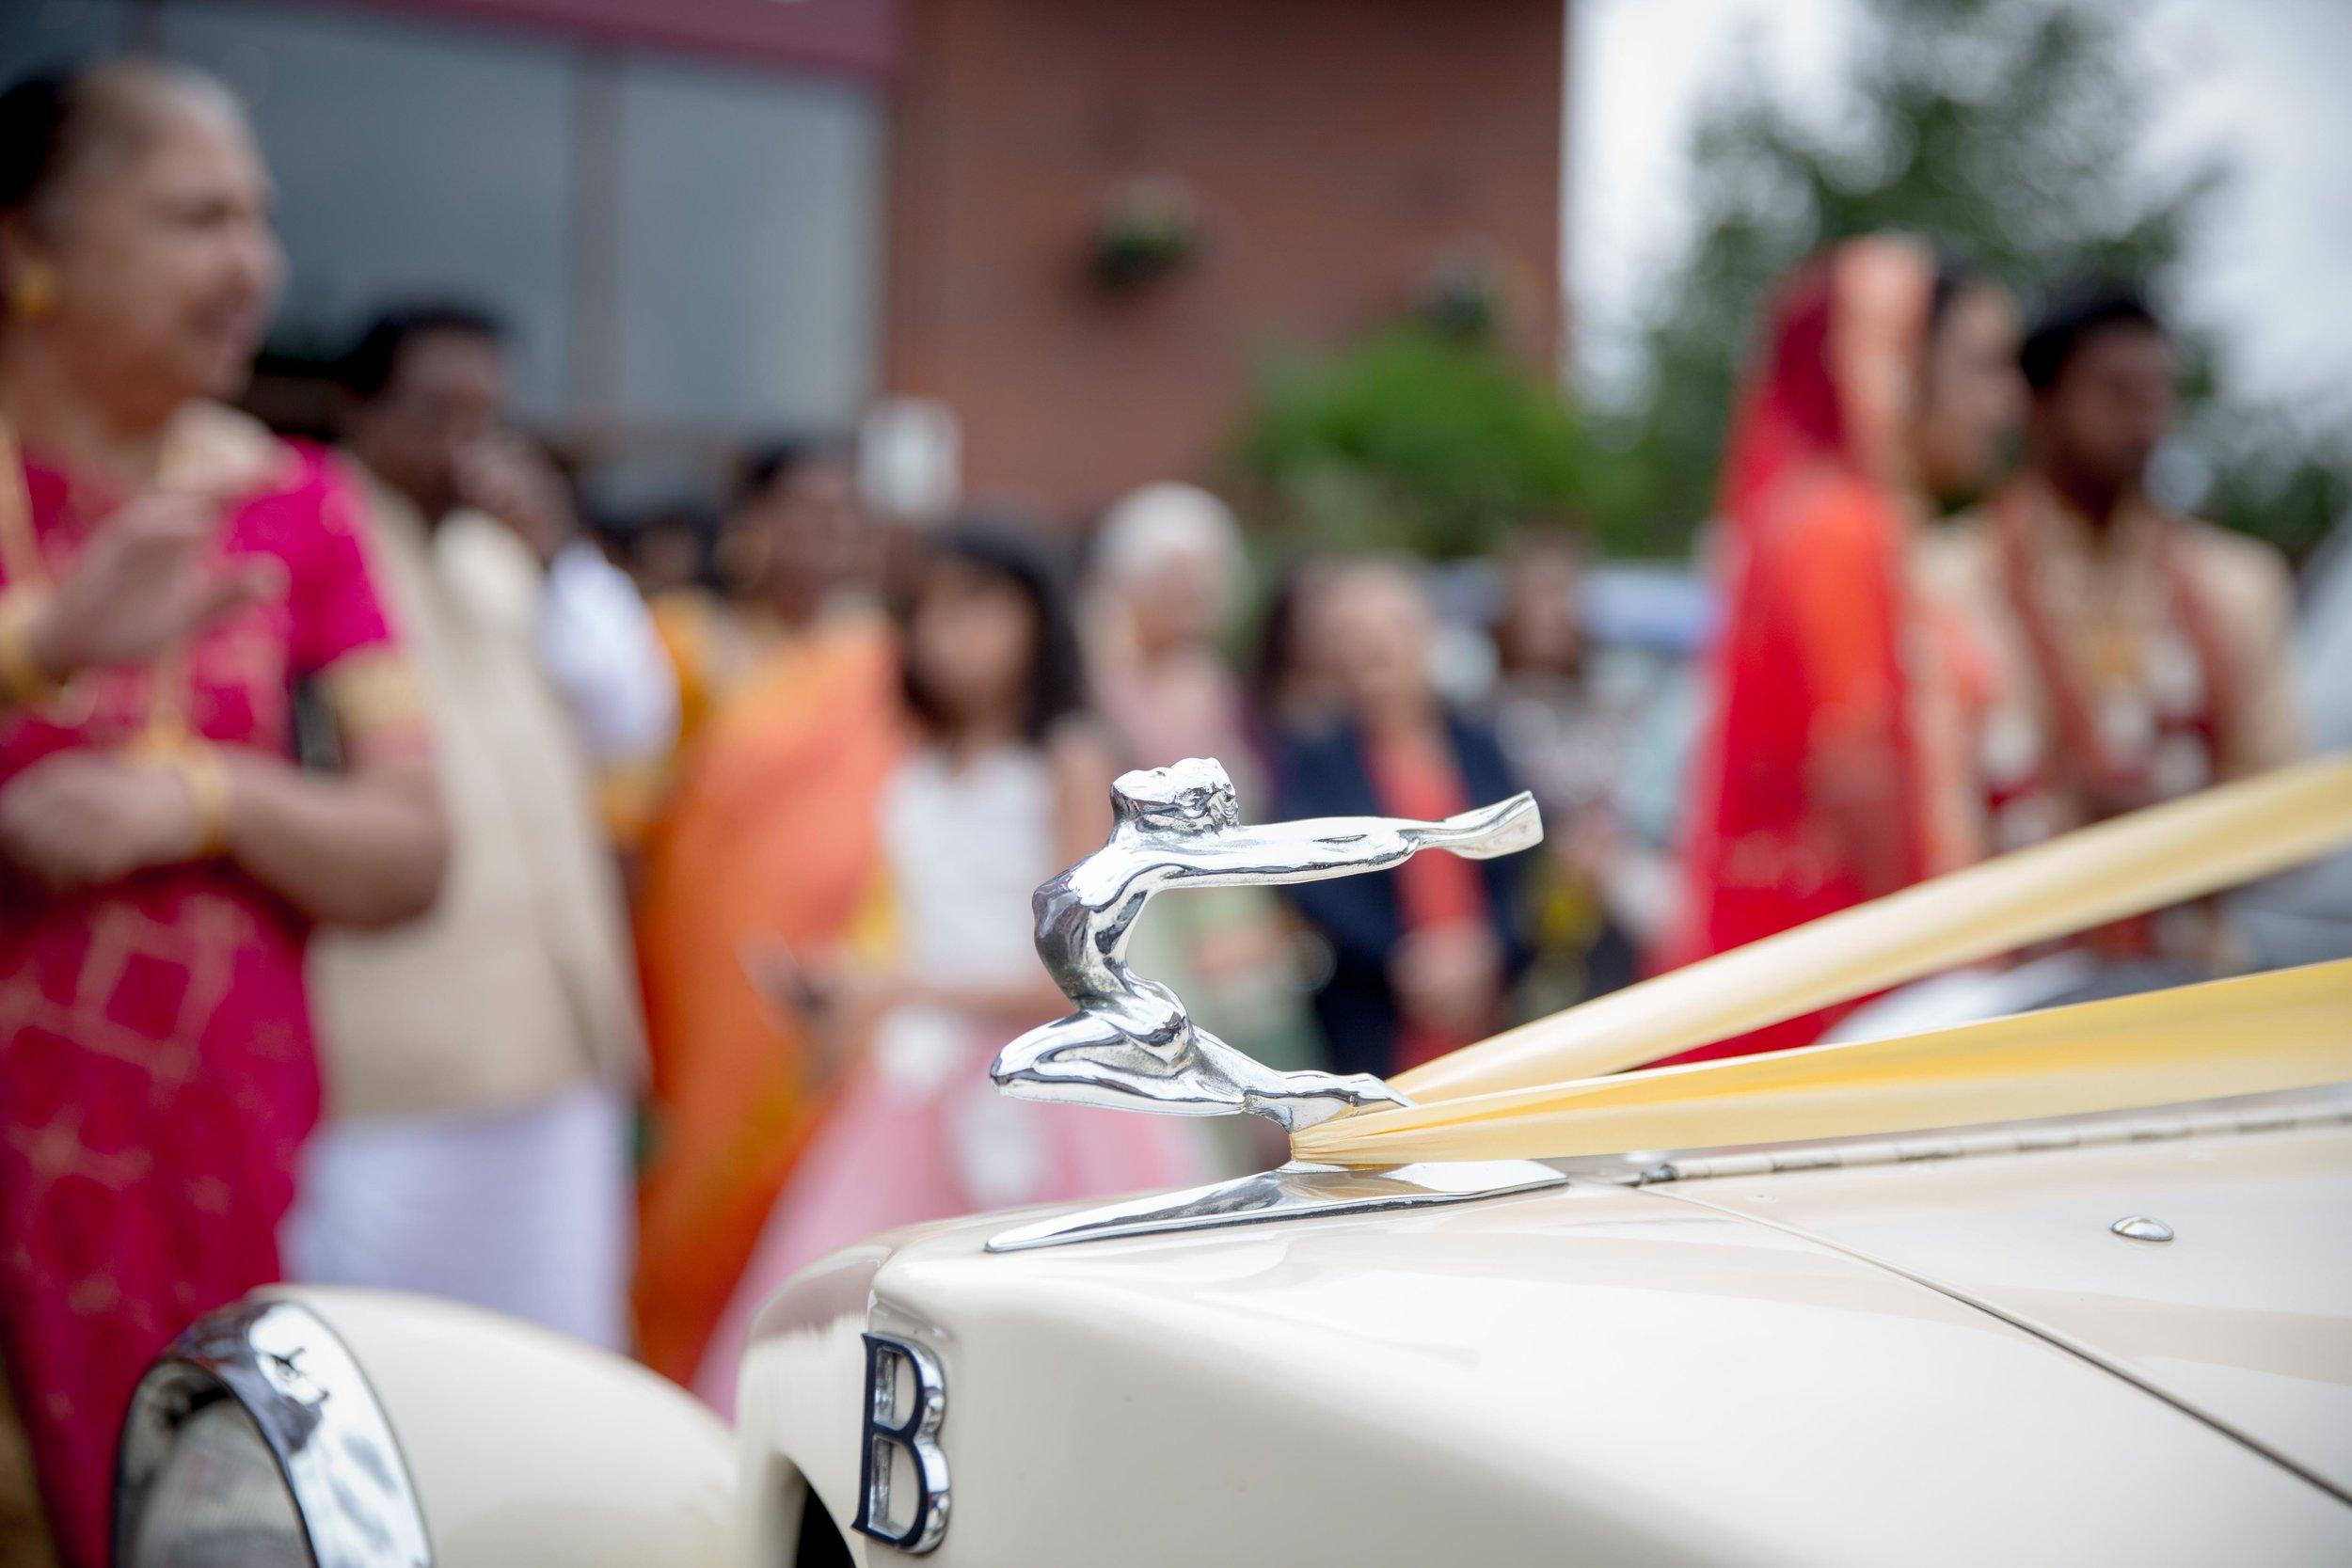 premier-banquetting-london-Hindu-asian-wedding-photographer-natalia-smith-photography-48.jpg